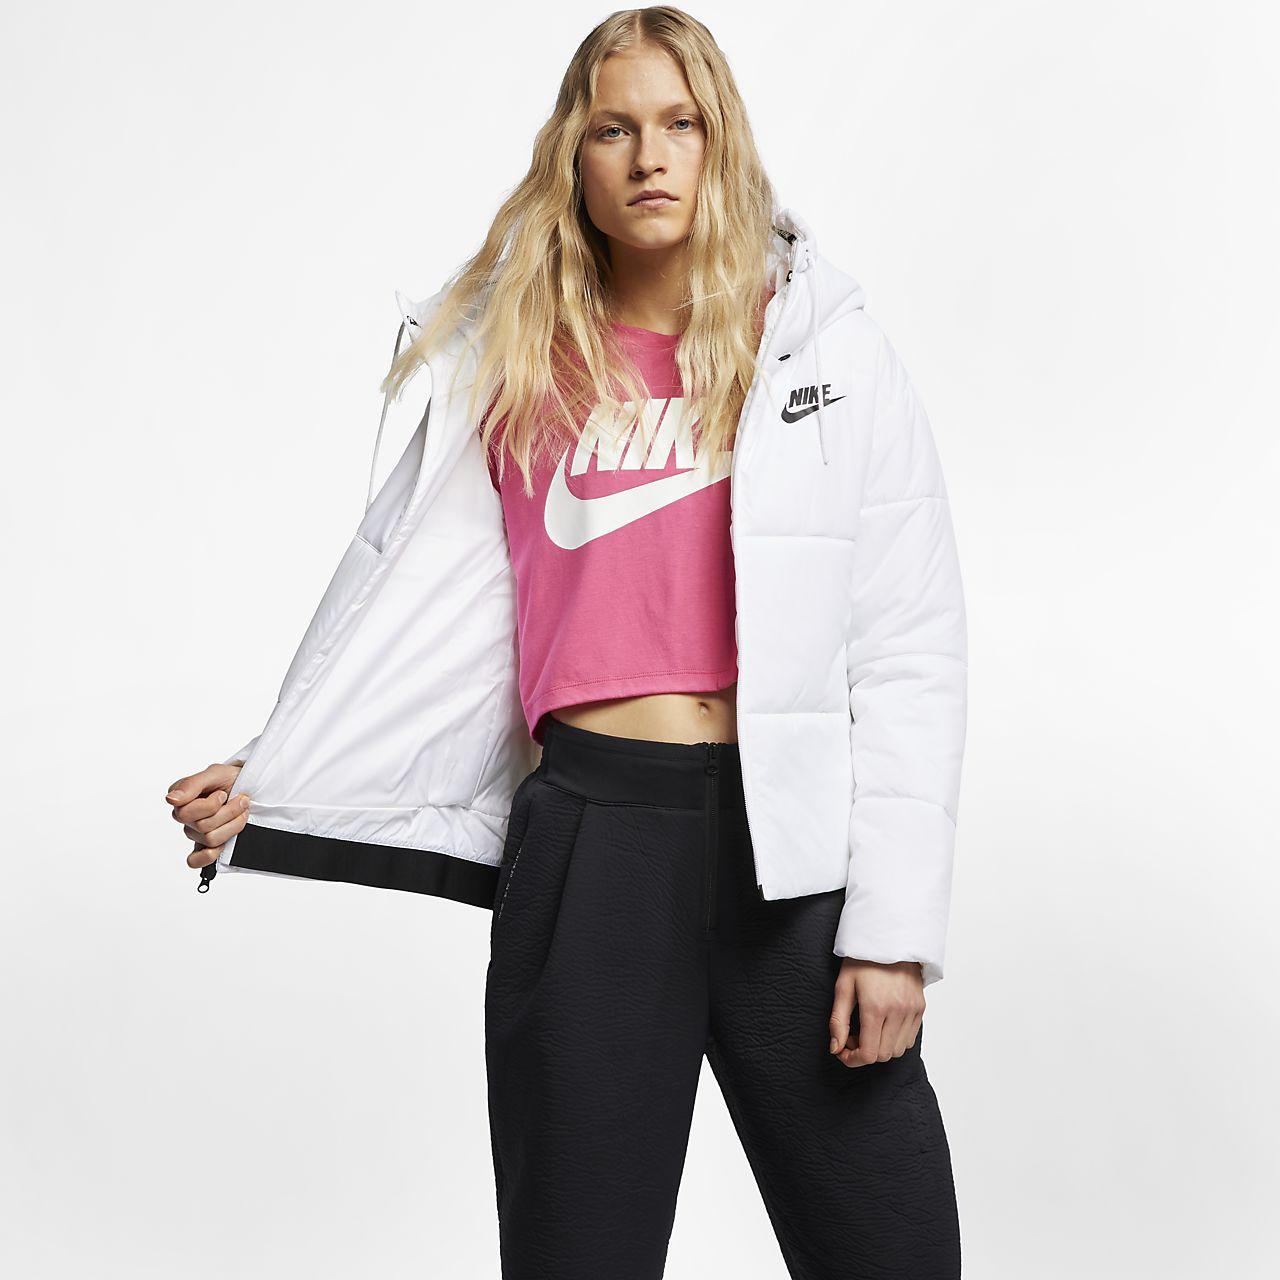 Ca Pour Fill À Nike Femme Veste 5f60pq Synthetic Capuche Sportswear MqSUpzVG